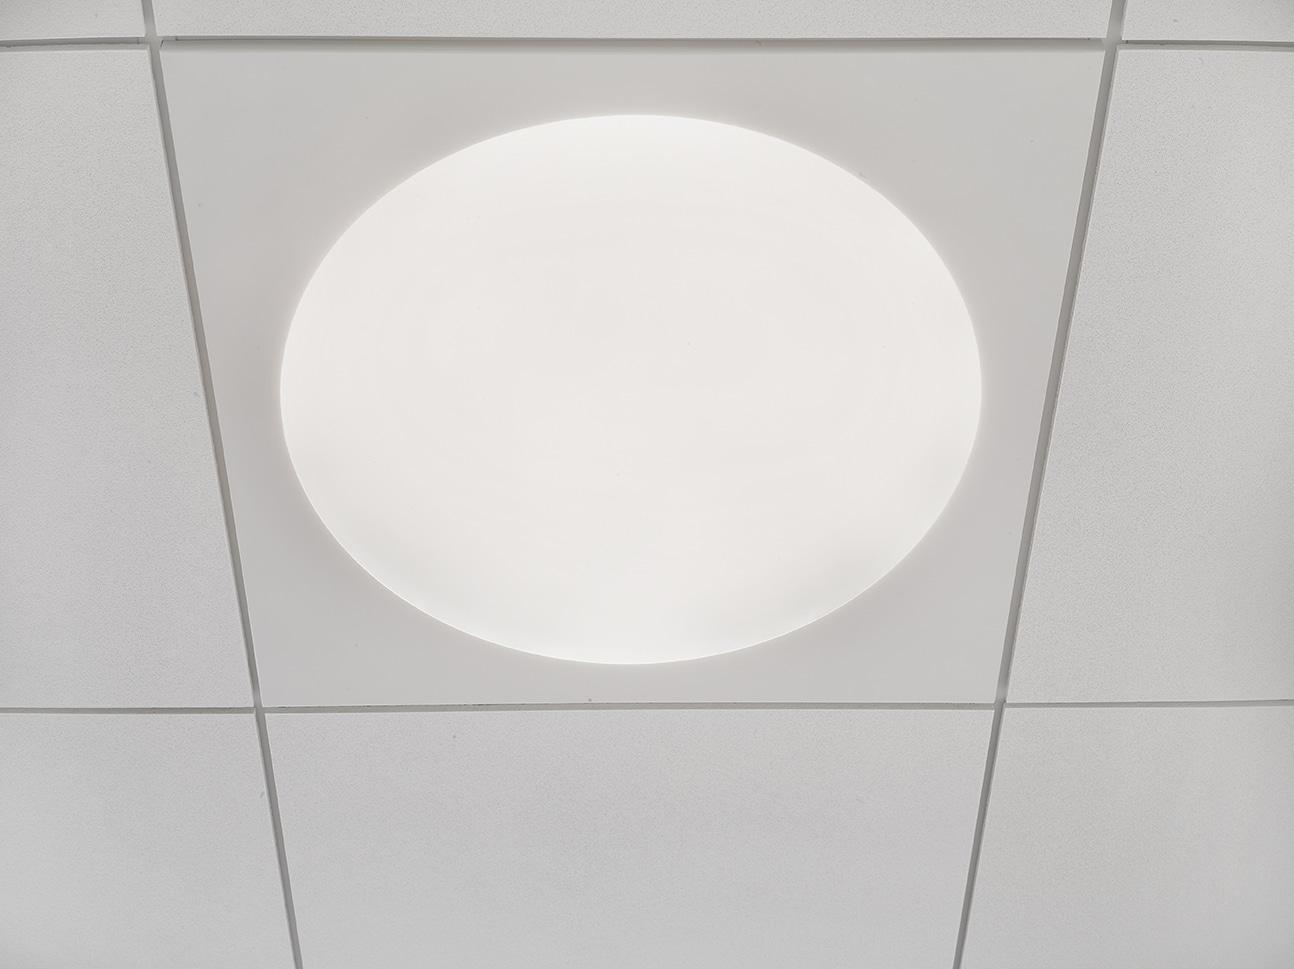 Ledgo circle panel lampe monteret i gips loft hos Odense Katedralskole nærbillede - Luminex